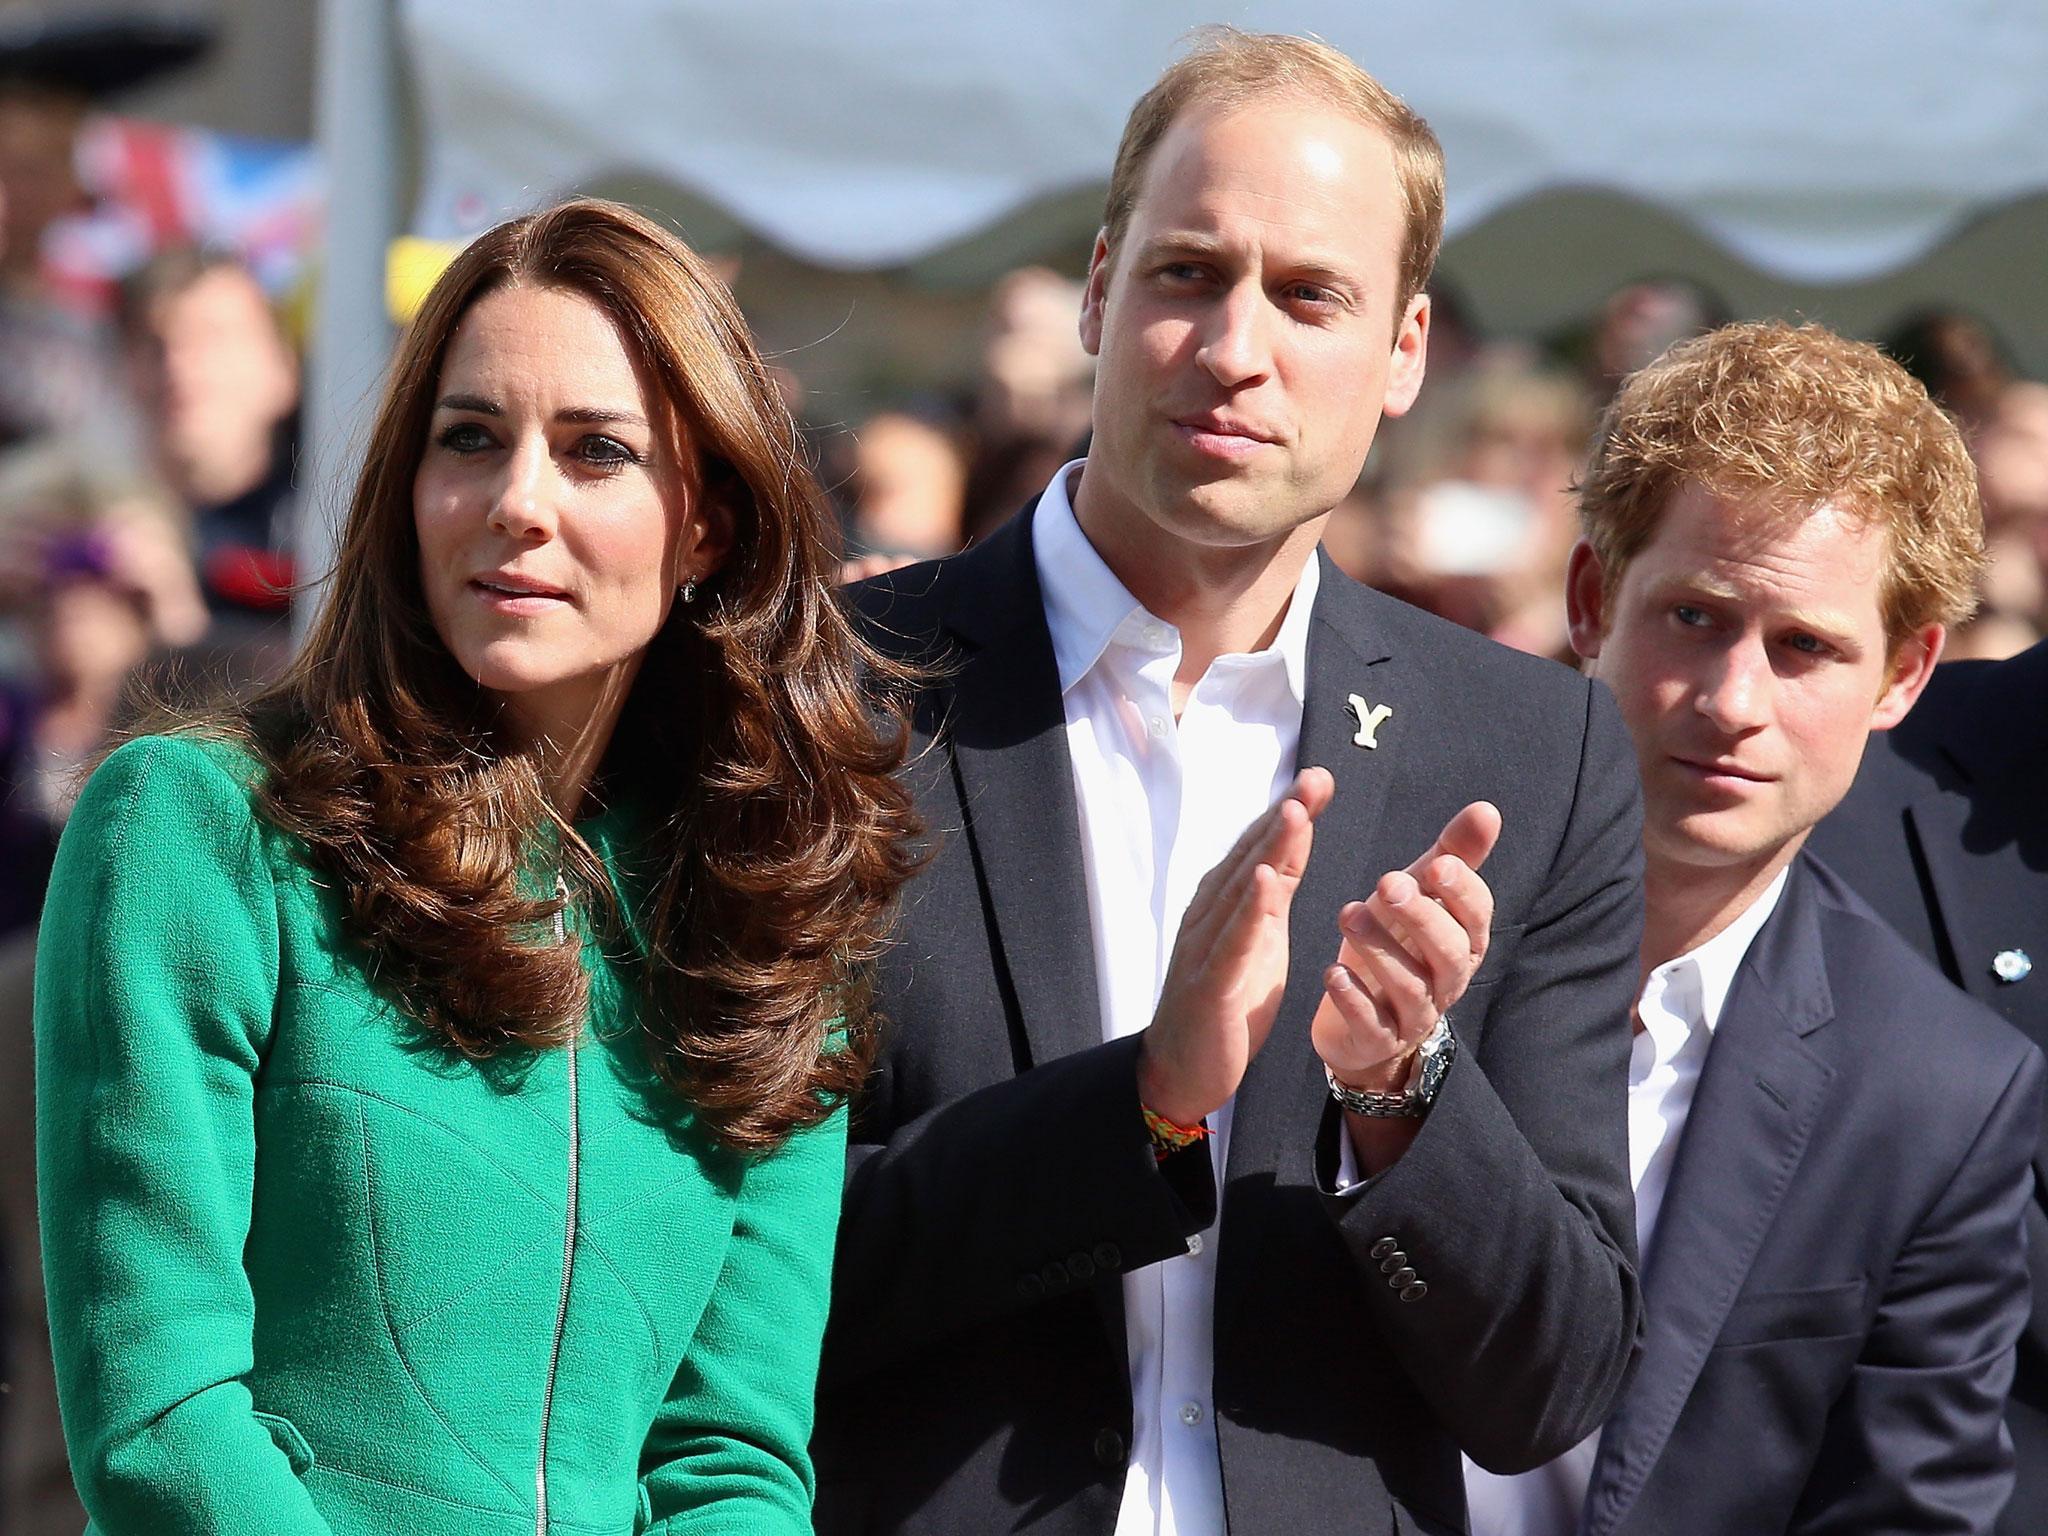 On royal family: